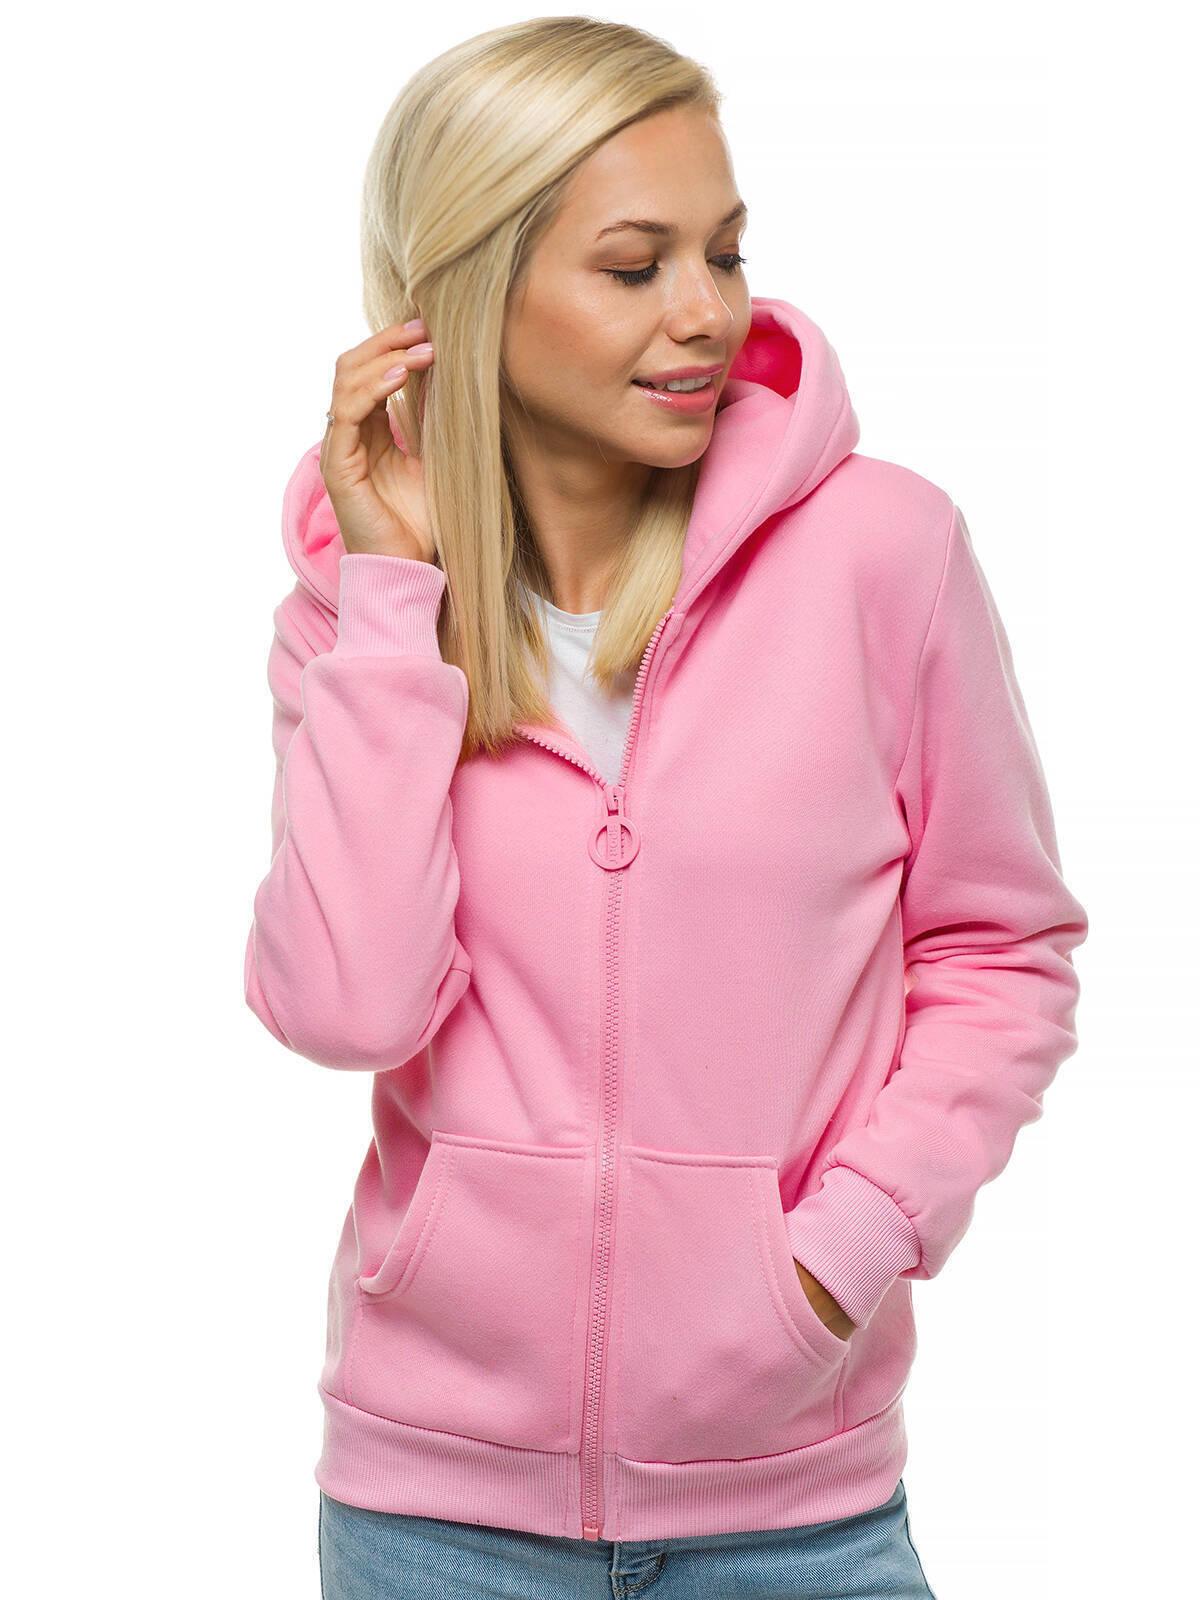 Kapuzenpullover Sweatjacke Sweatshirt Pullover Hoodie Kapuze Zip OZONEE 18 Damen